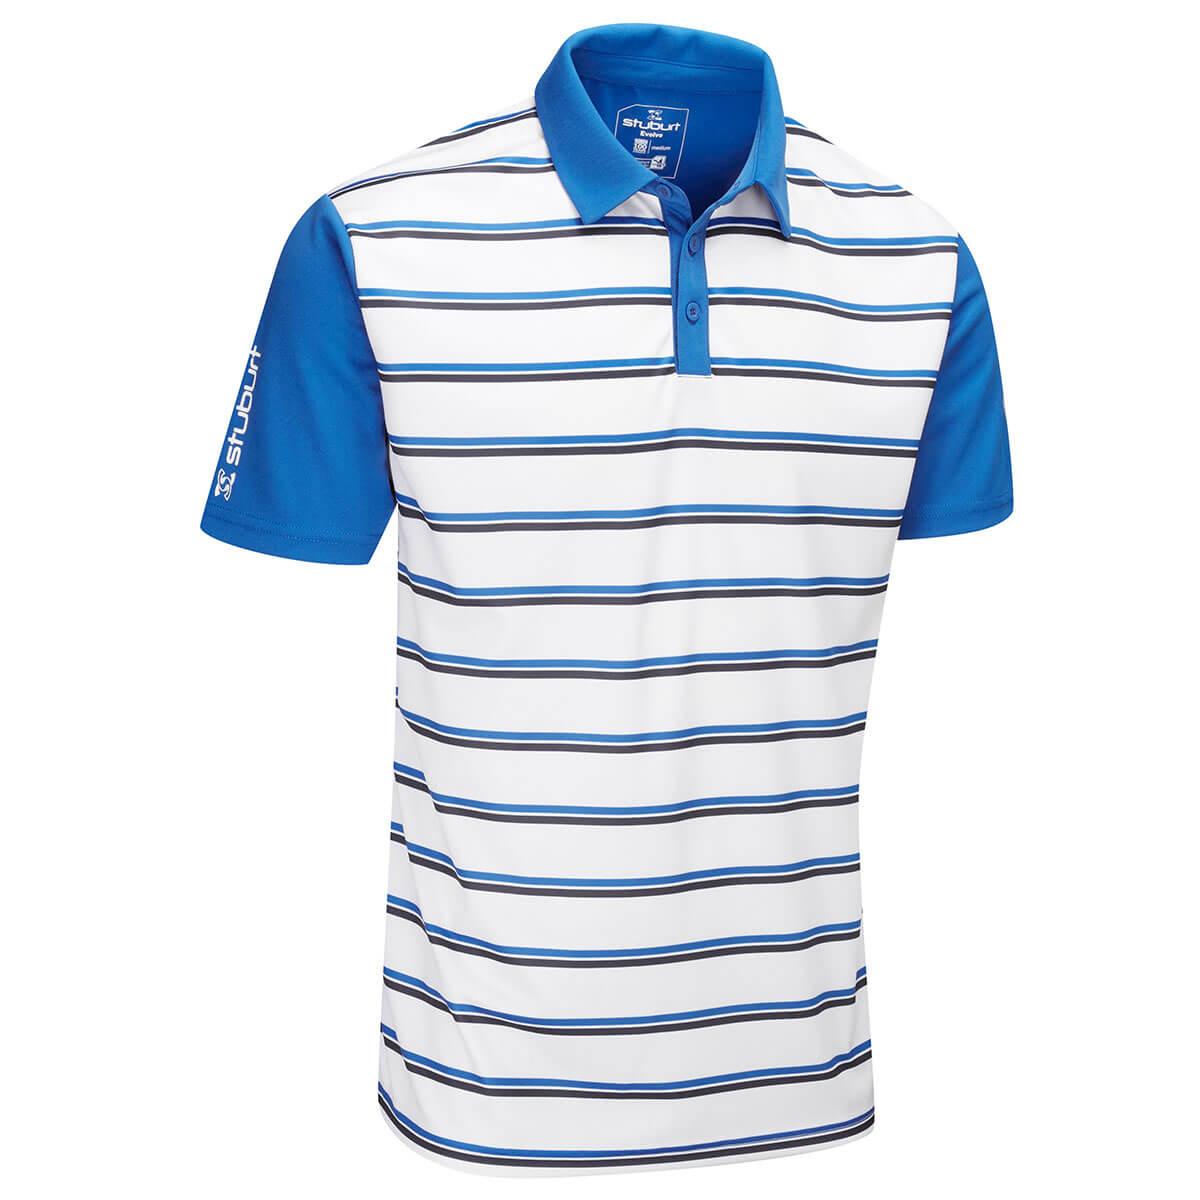 338661da2 Stuburt Mens 2019 Evolve Apley Moisture Wicking Lighweight Golf Polo Shirt